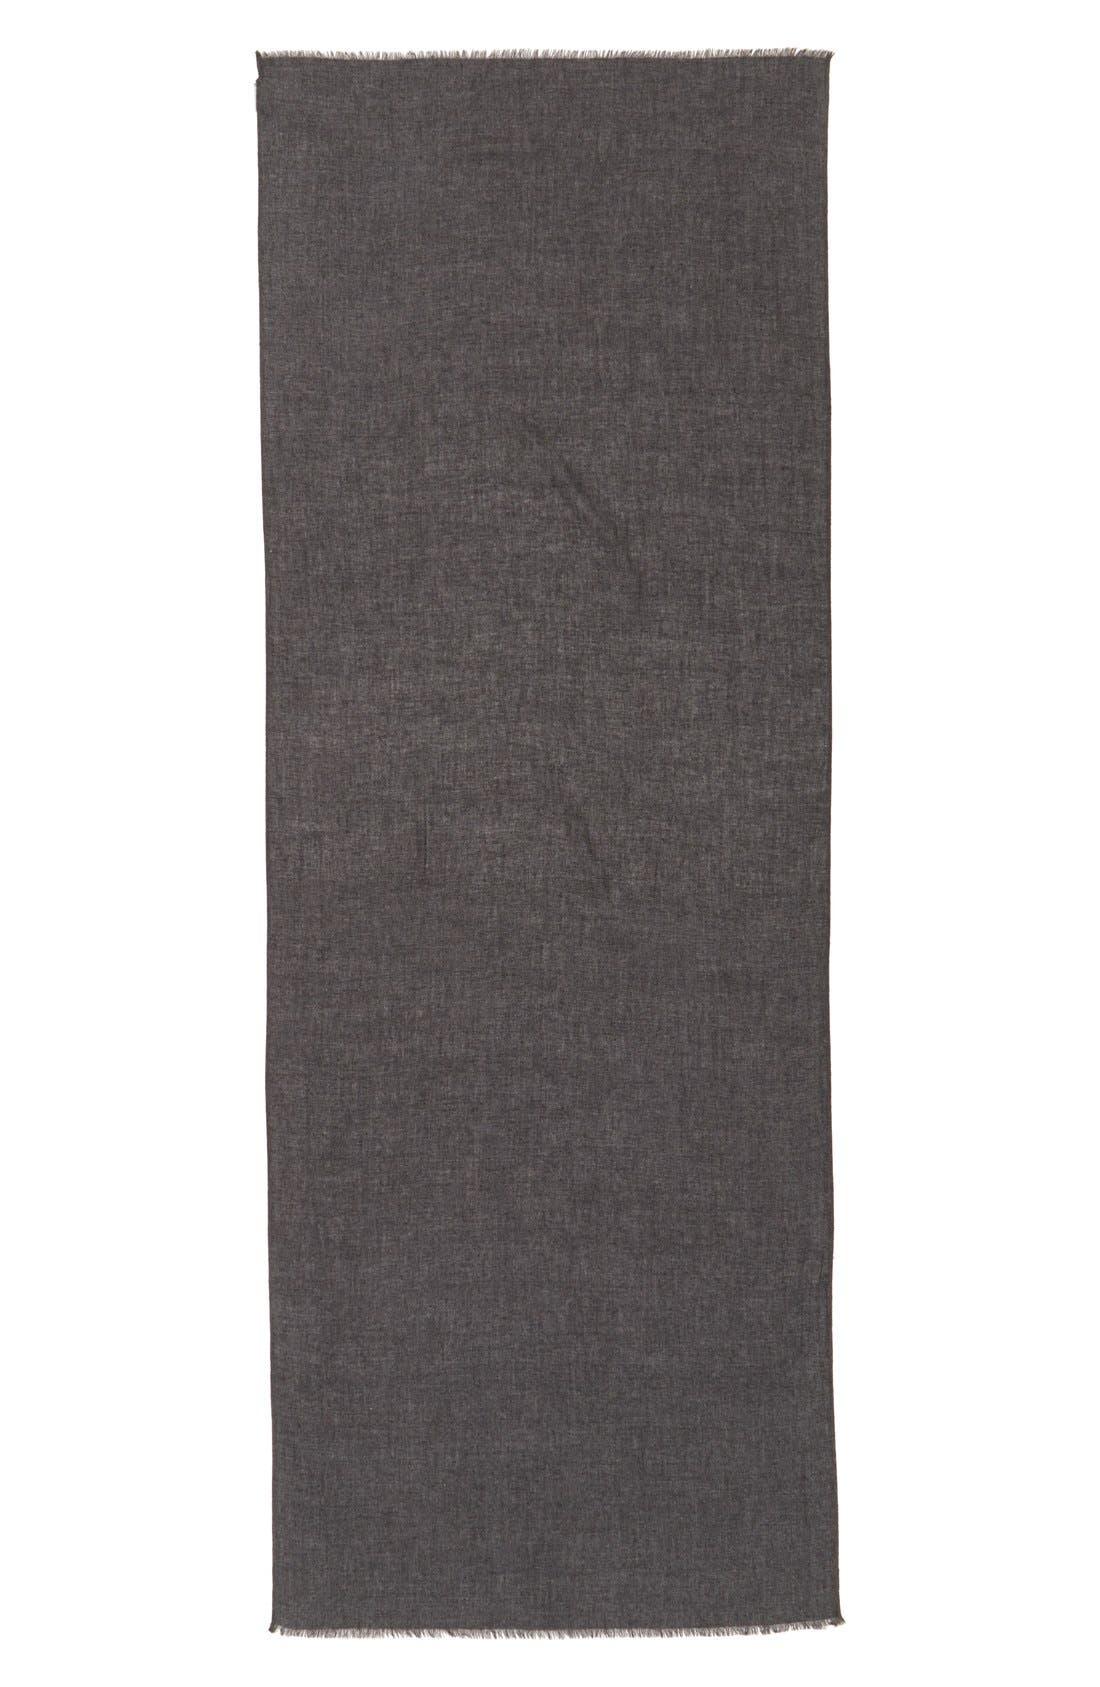 Wool & Cashmere Wrap,                             Alternate thumbnail 24, color,